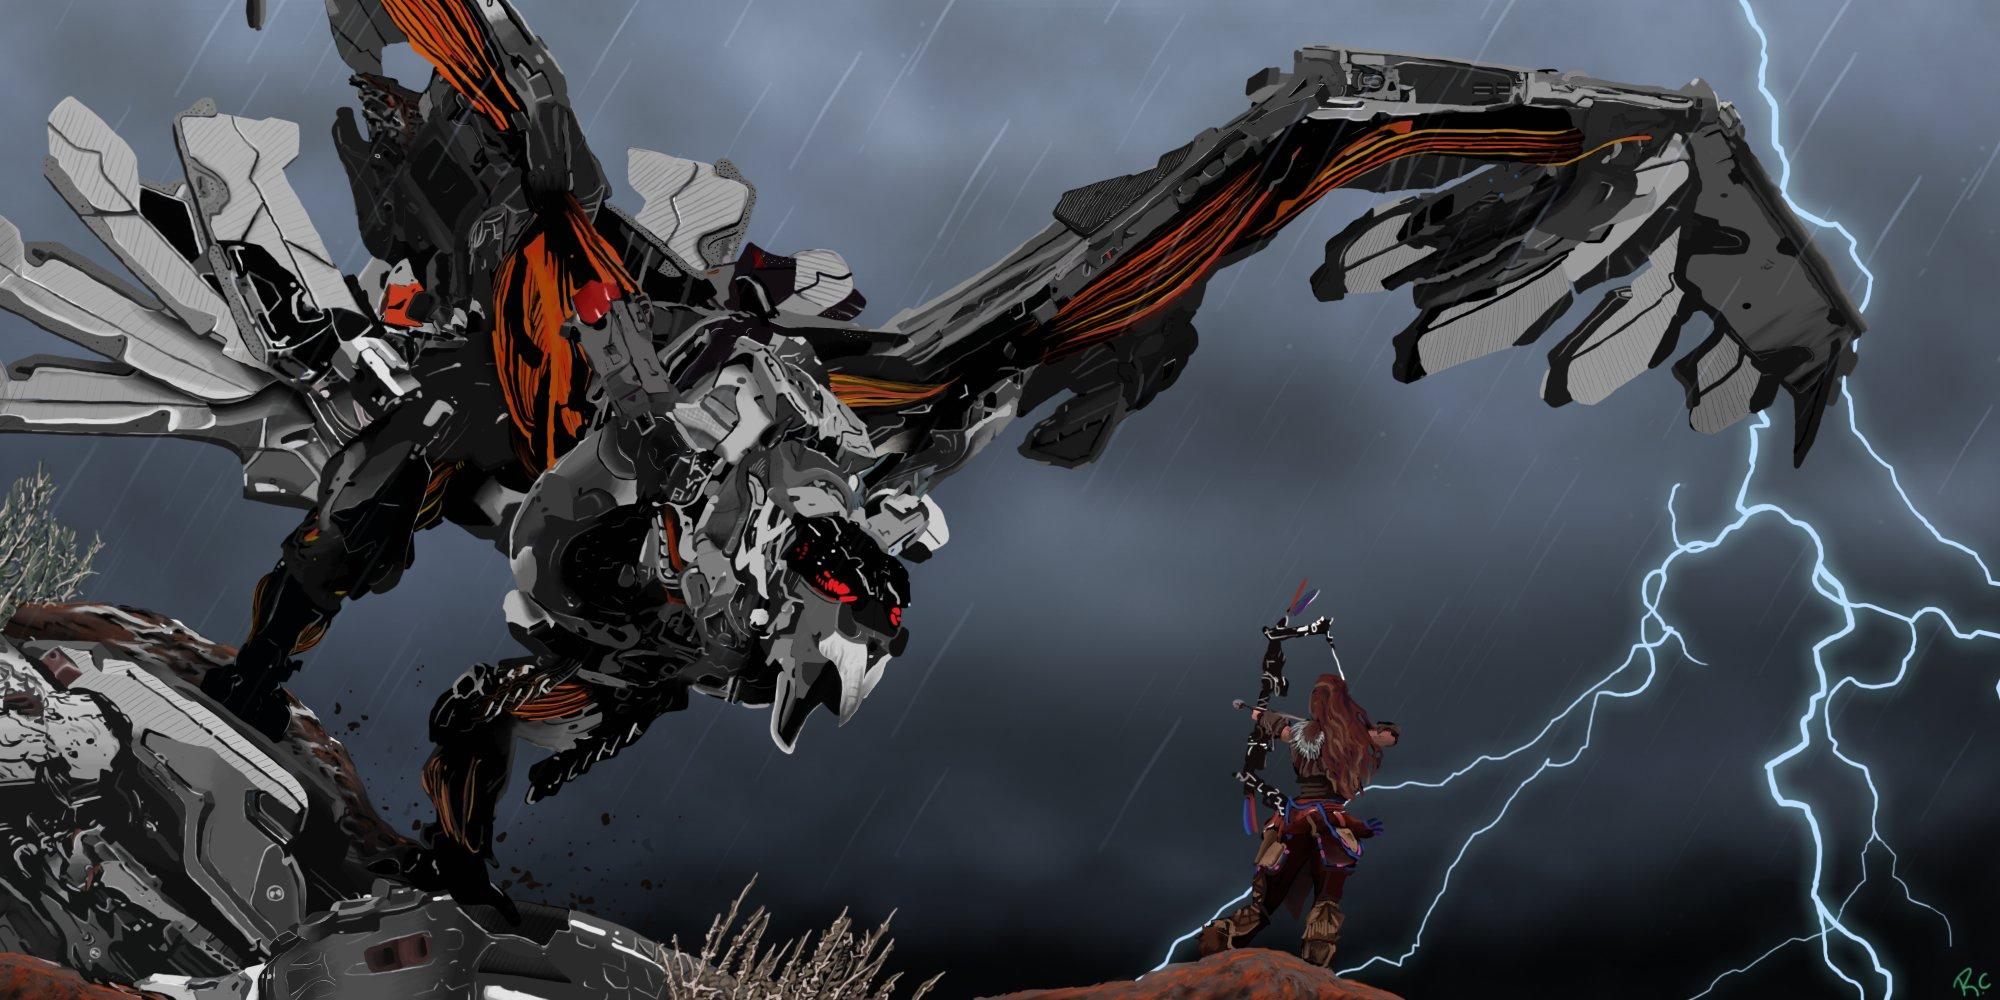 Fall Of Cybertron Wallpaper Hd Horizon Zero Dawn Sci Fi Robot Futuristic 1hzd Archer